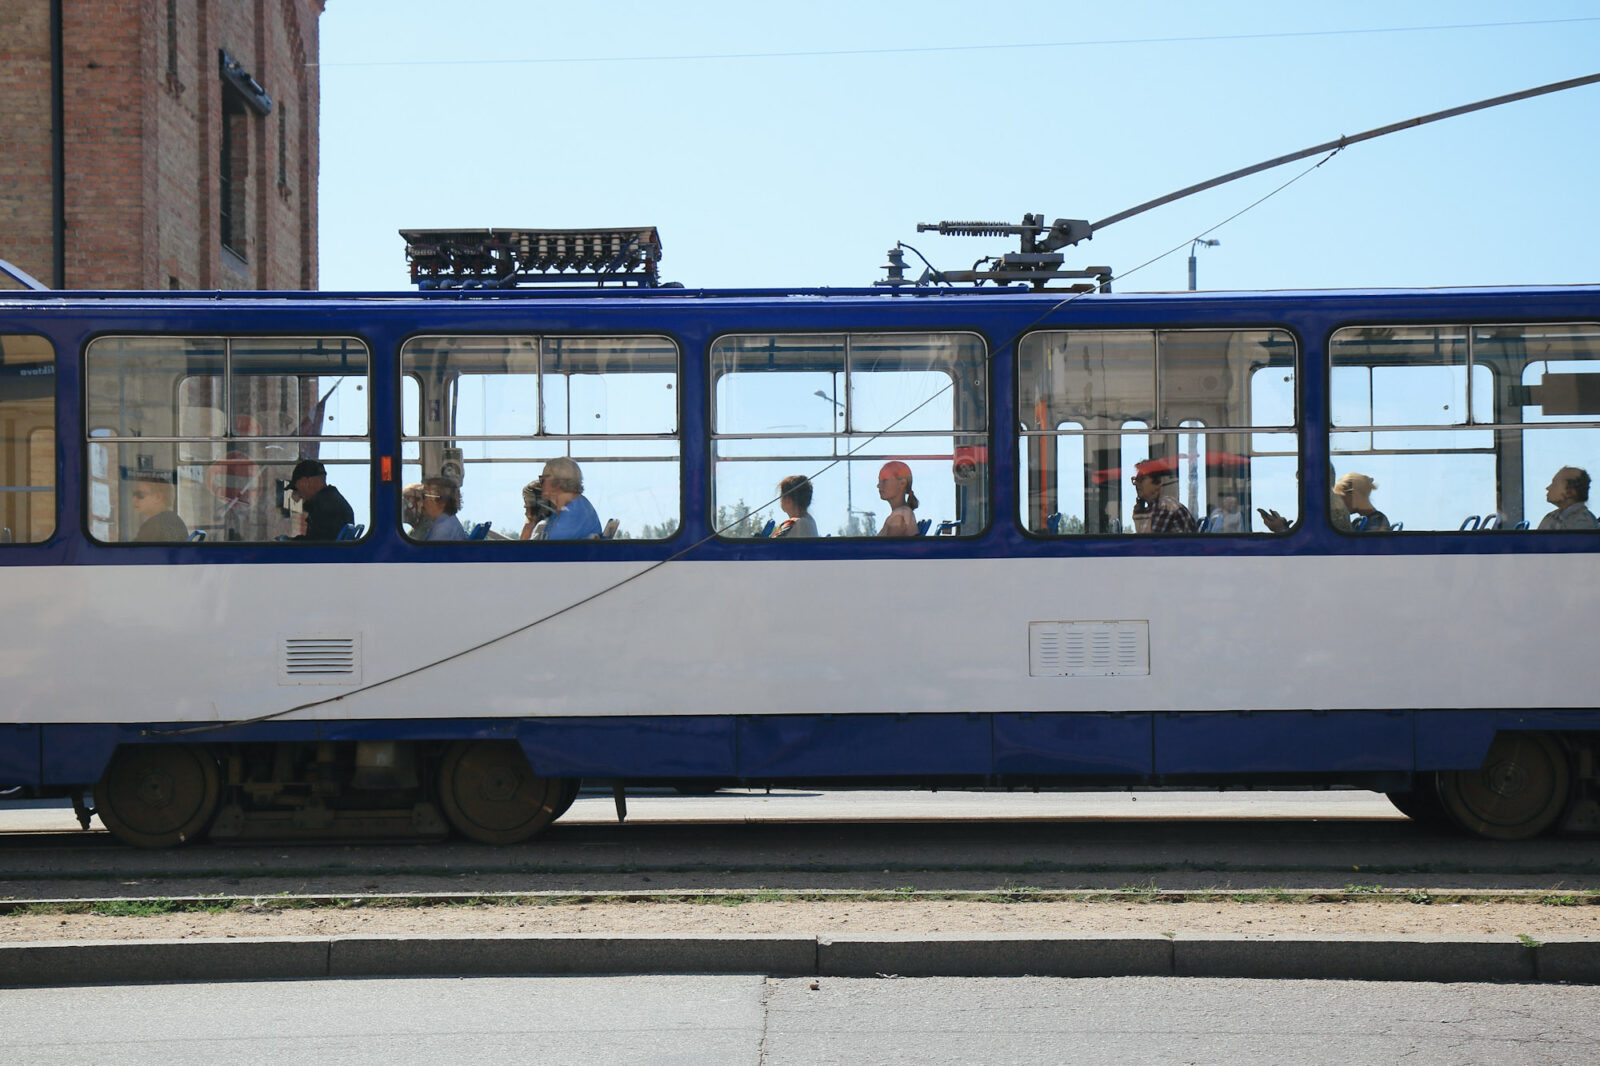 Städtereise Riga Öffentliche Verkehrsmittel Straßenbahn